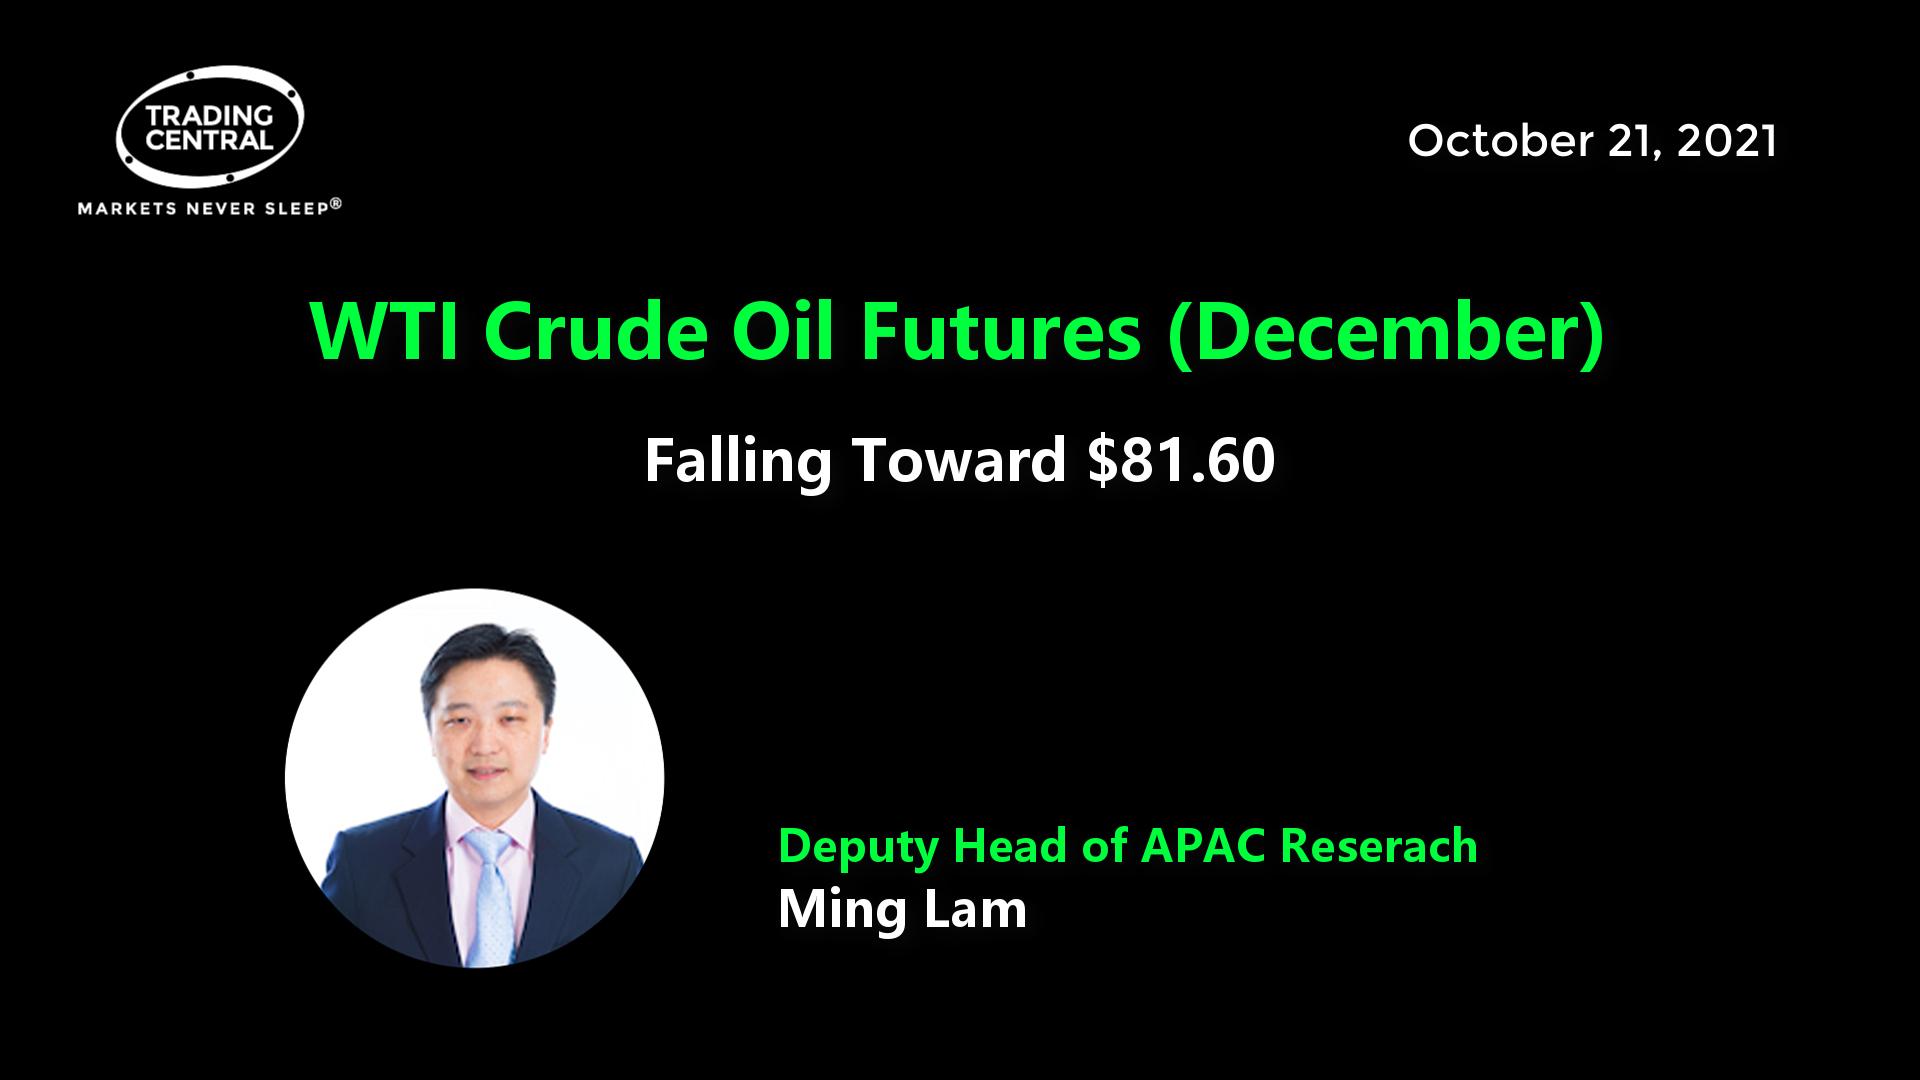 WTI Crude Oil Futures (December) - Falling Toward $81.60